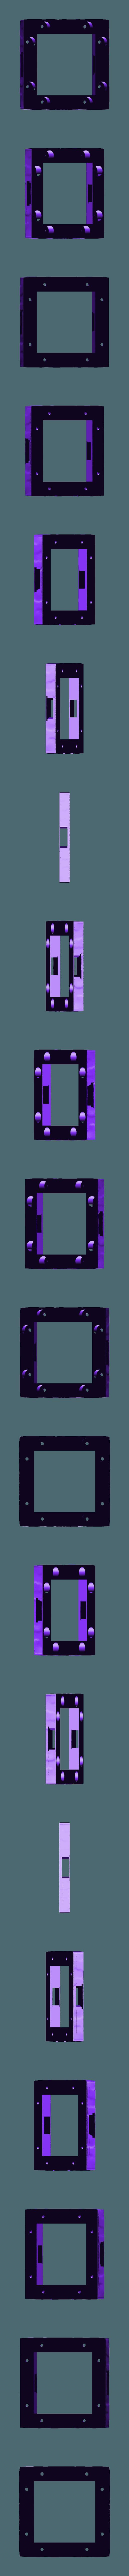 cavern_magnetic_openlock_base_2x2.stl Download free STL file Cavern Riser Blocks (Openforge 2.0 compatible) • Model to 3D print, Poxos